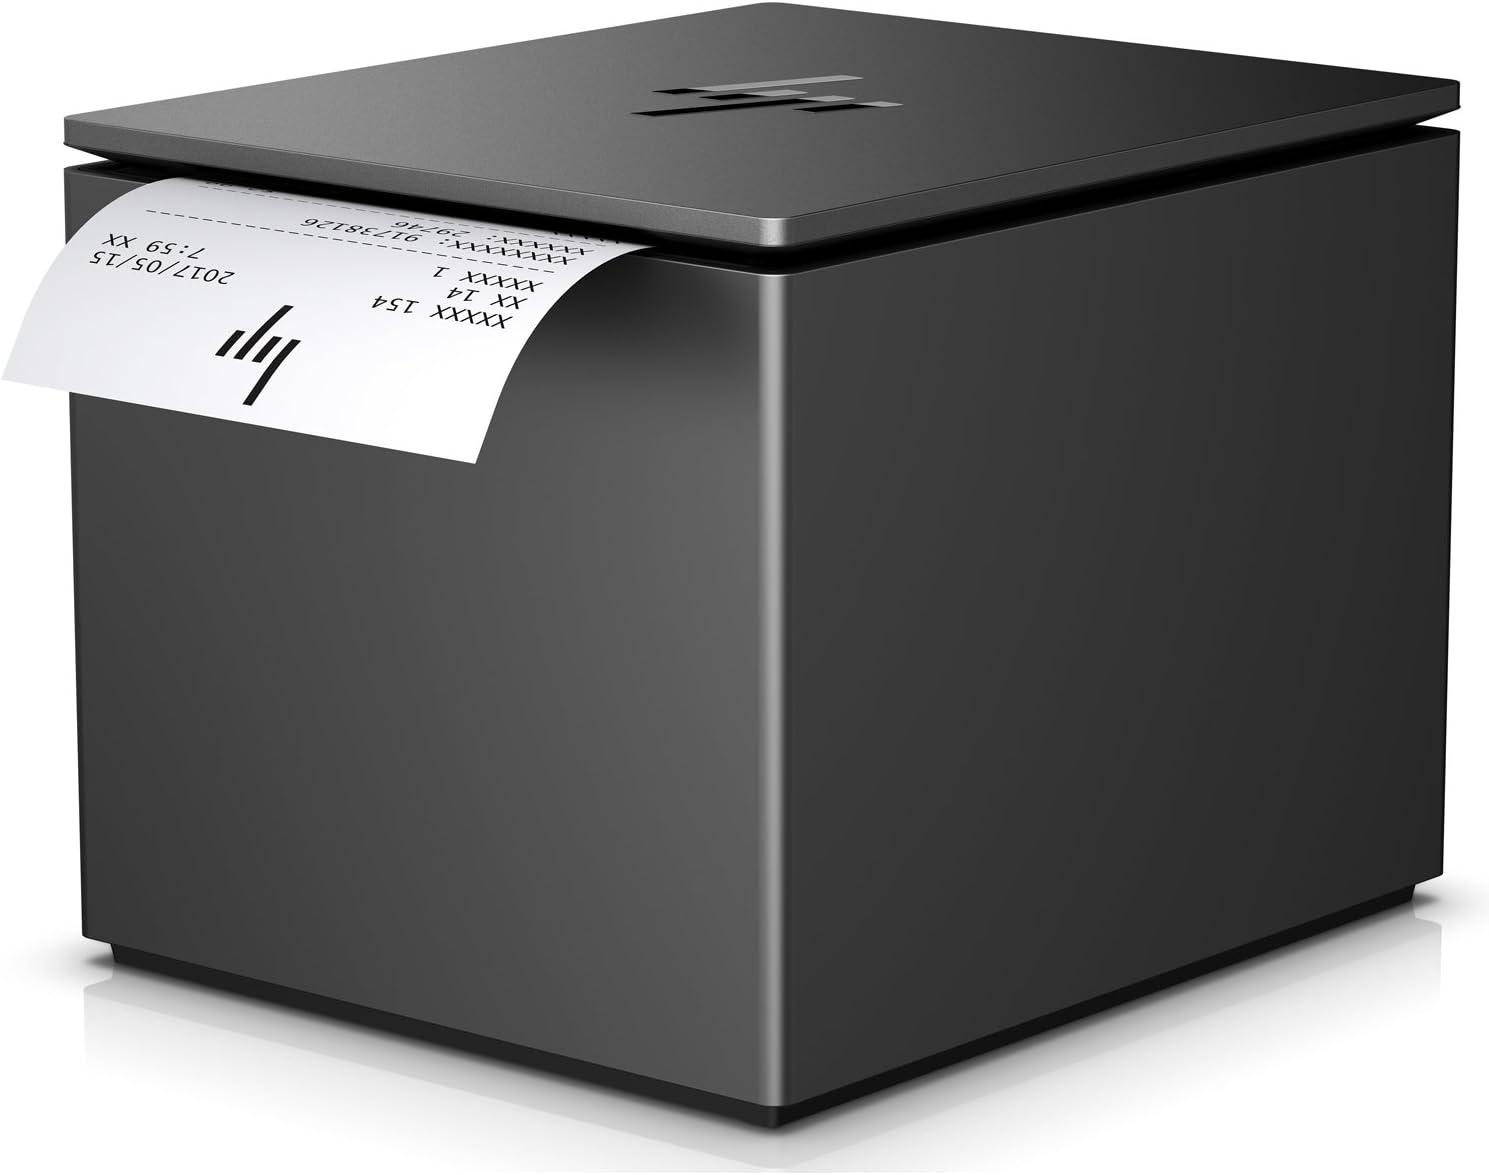 HP 1RL96AA Elite POS Serial USB Thermal Printer